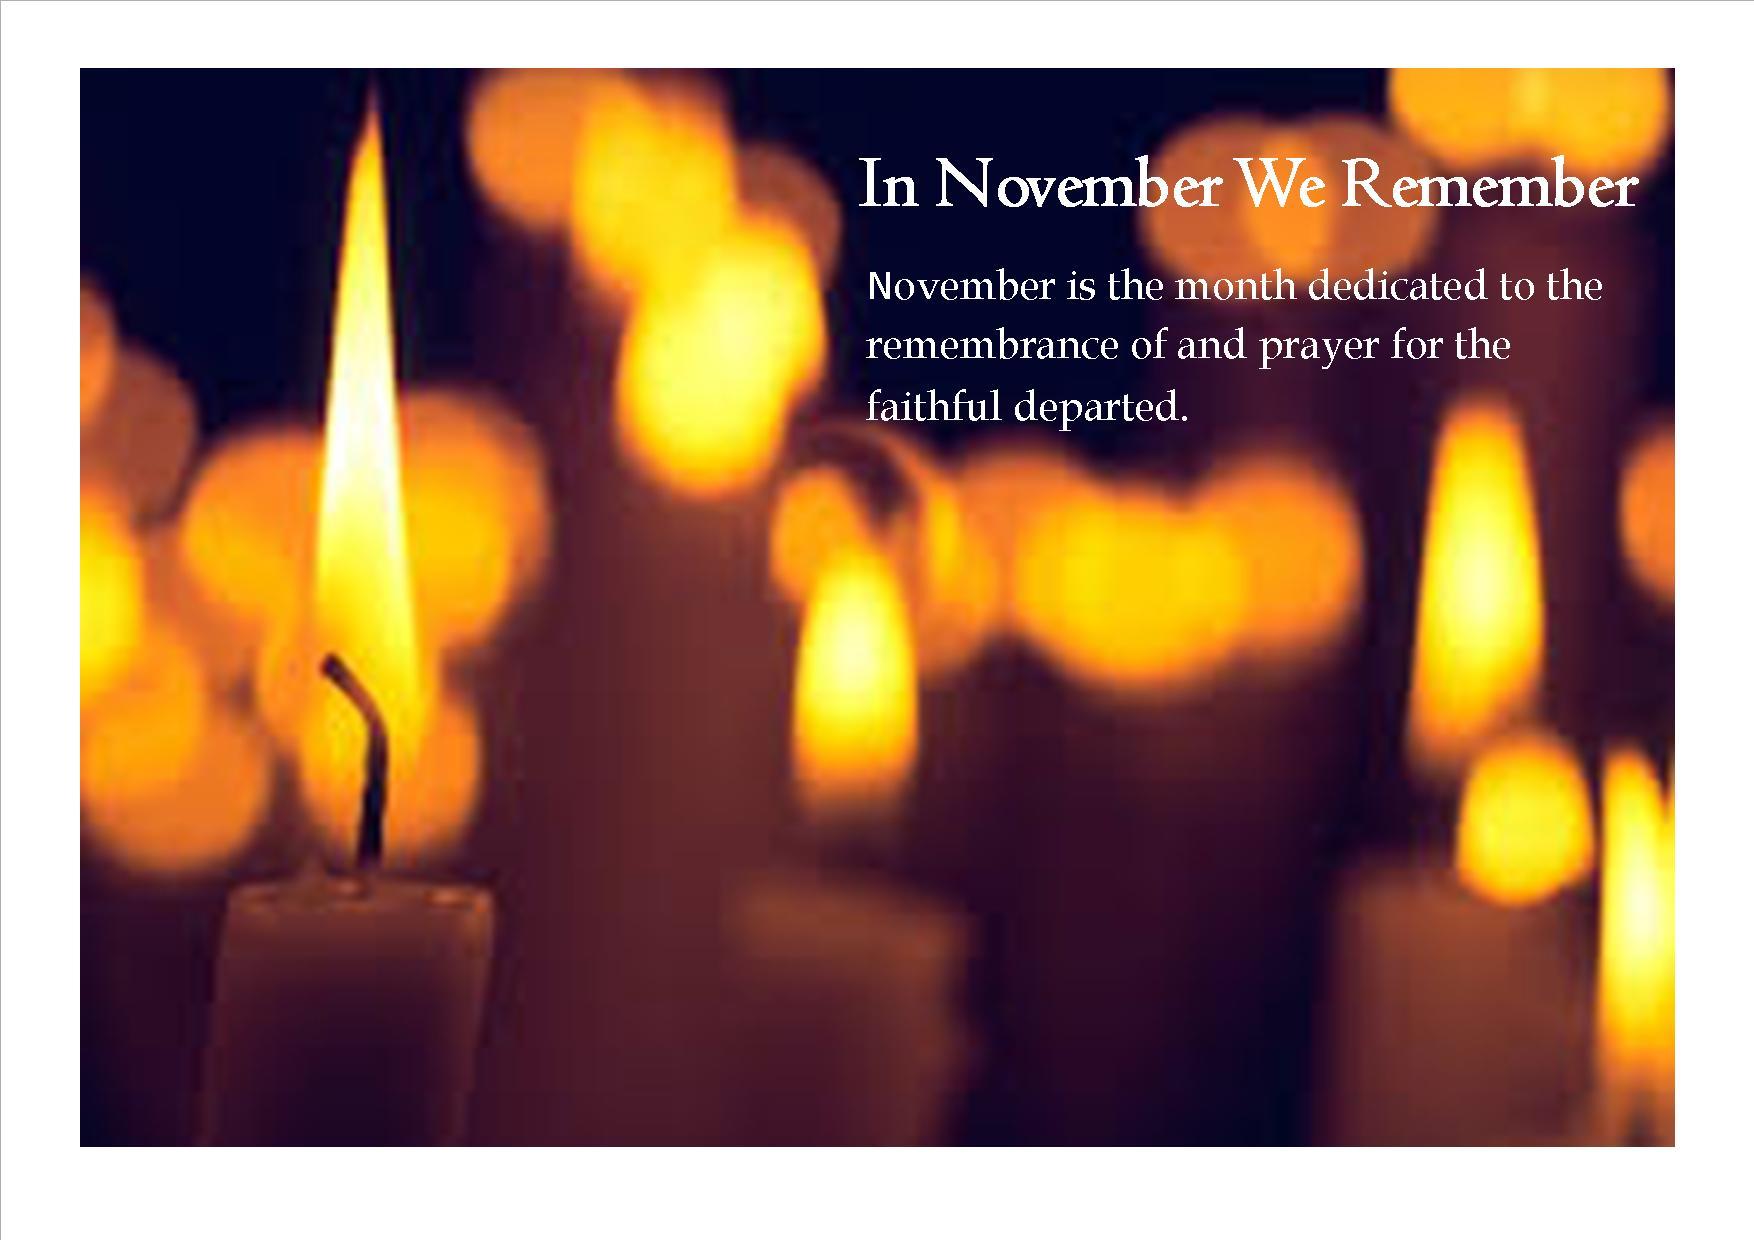 November Remembrance image